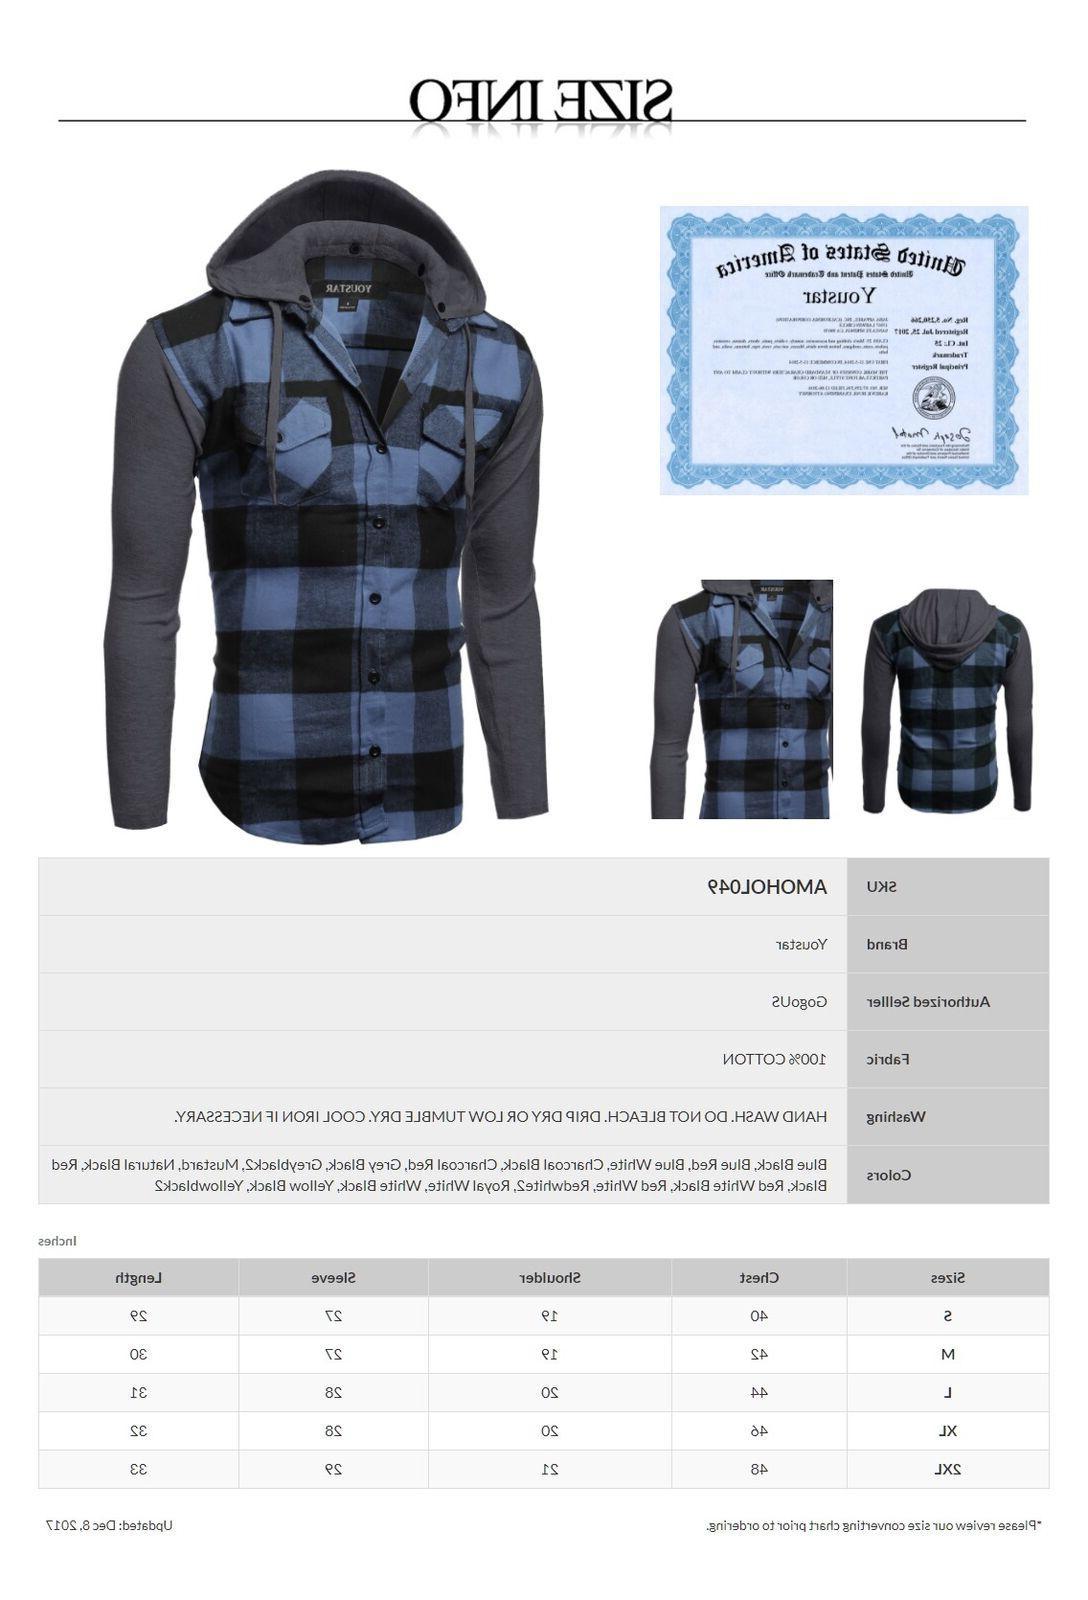 FashionOutfit Casual Plaid Check Detach Cotton Flannel Long Sleeve Shirt